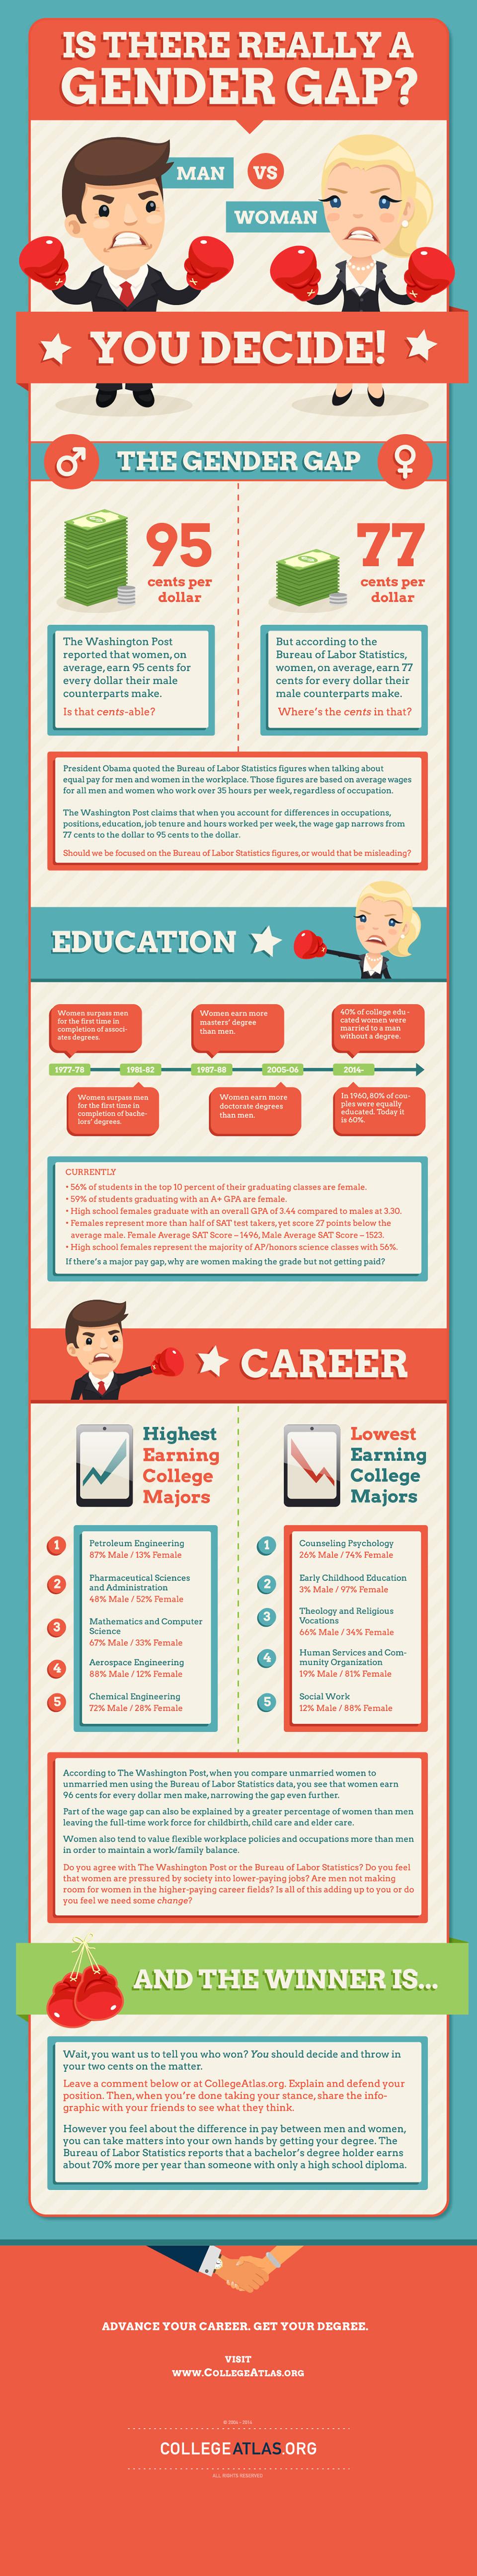 Gender Gap Infographic